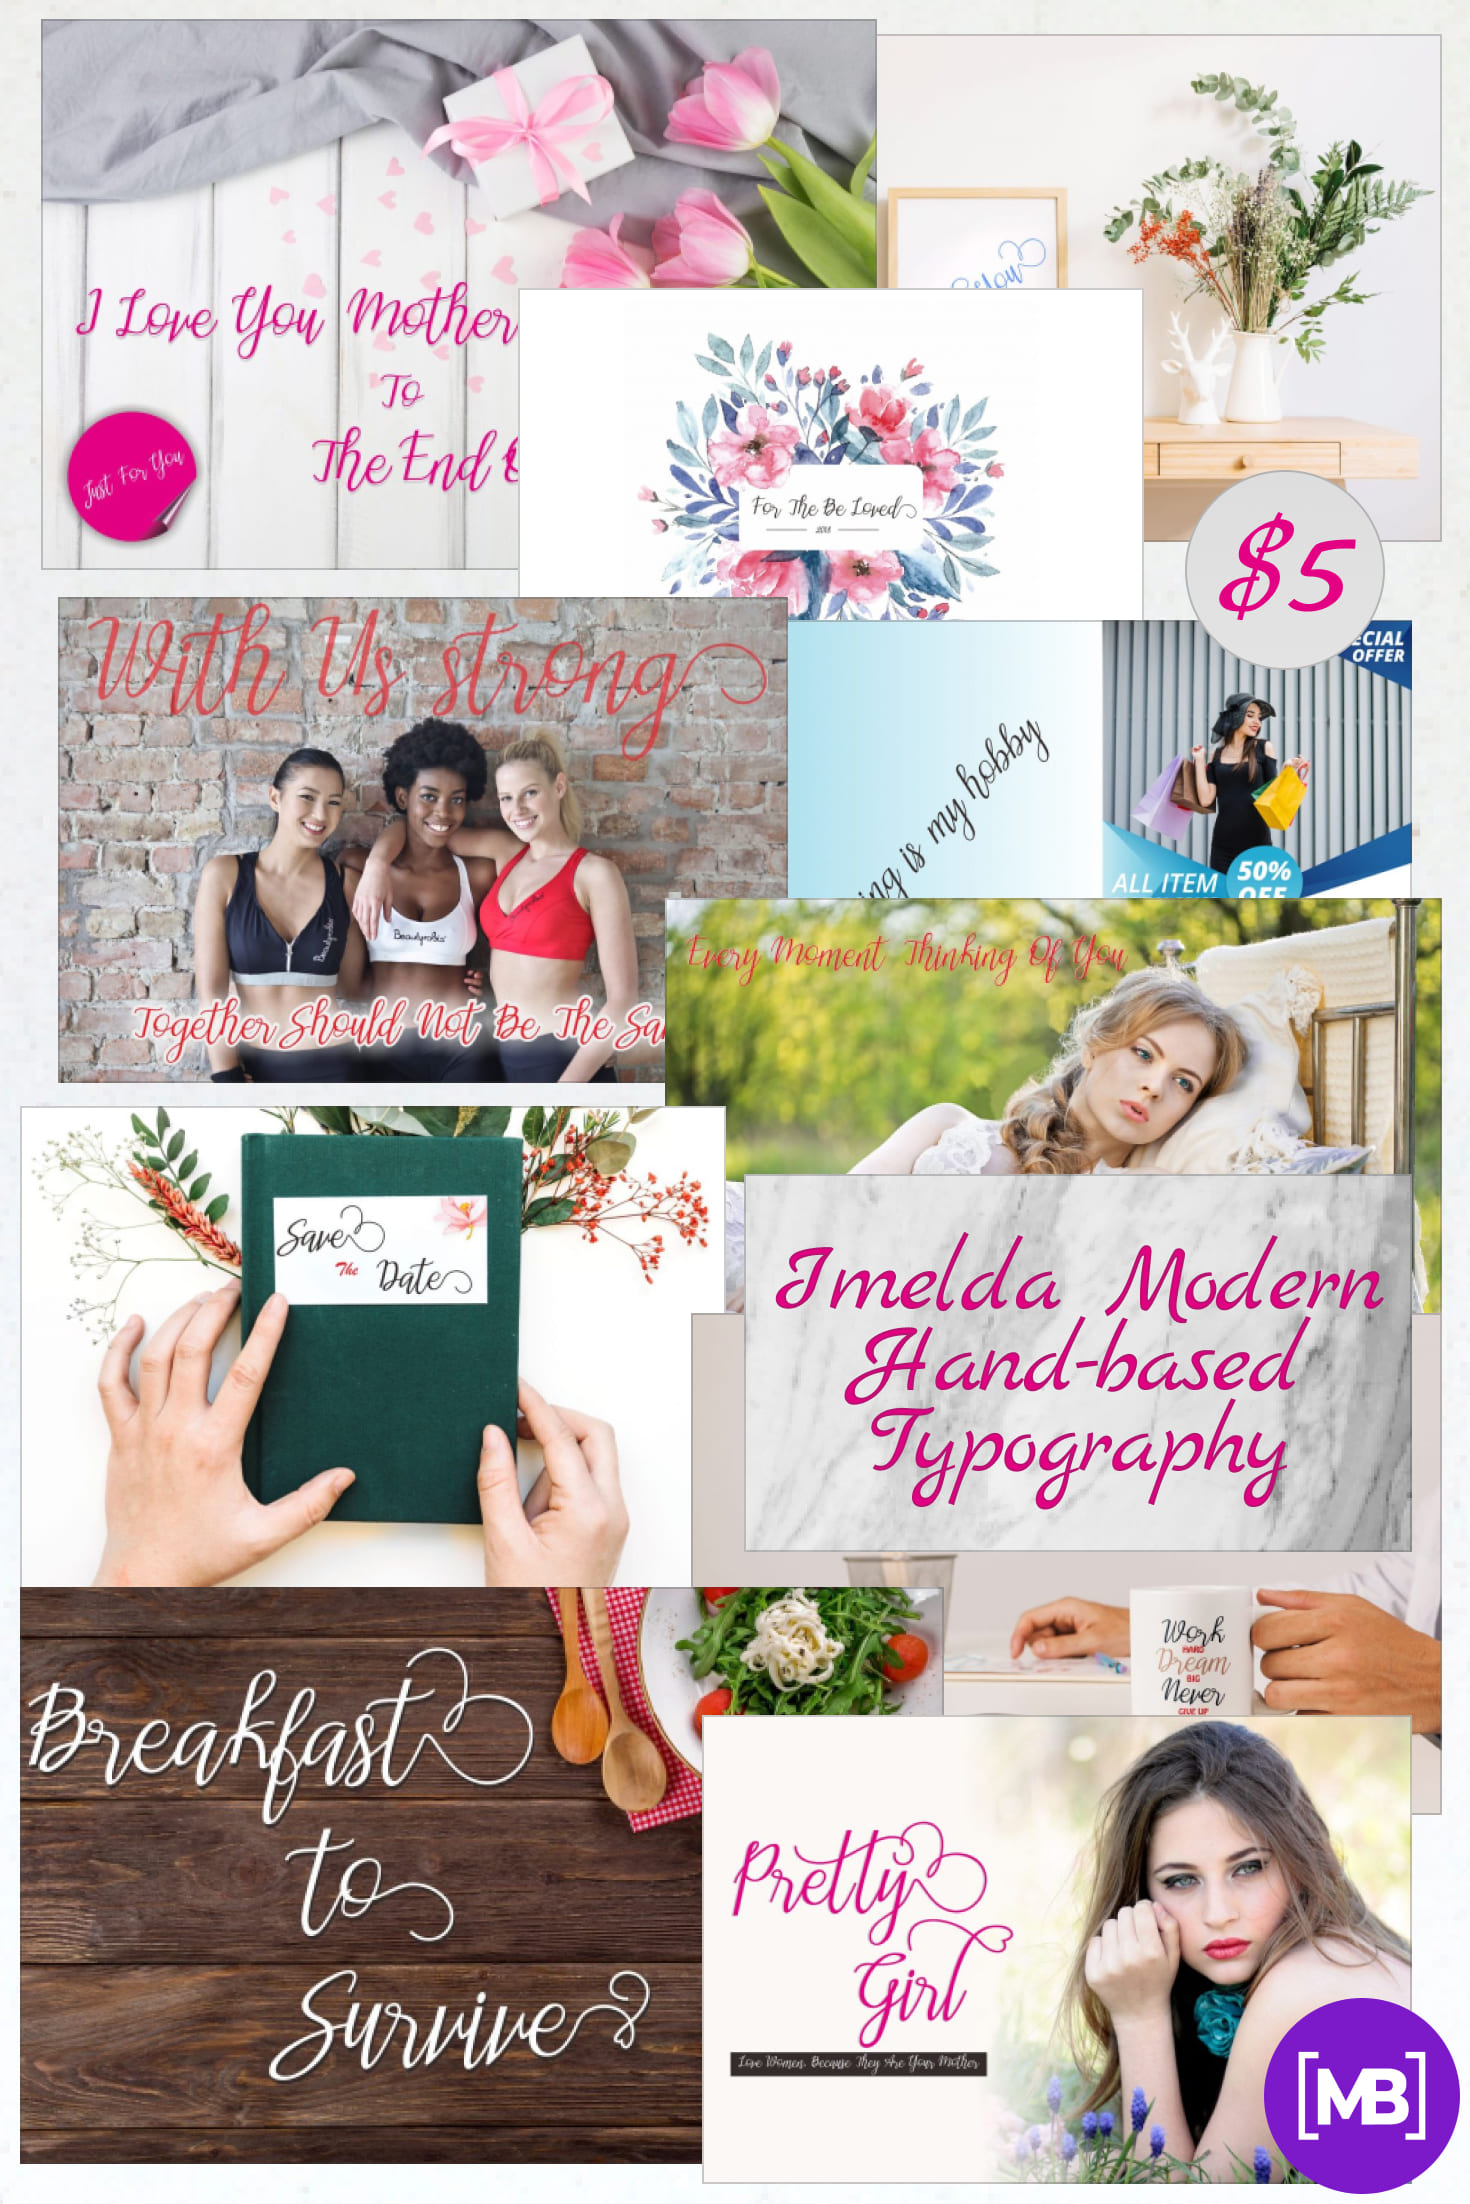 Pinterest Image: Imelda Modern Hand-based Typography - $5.